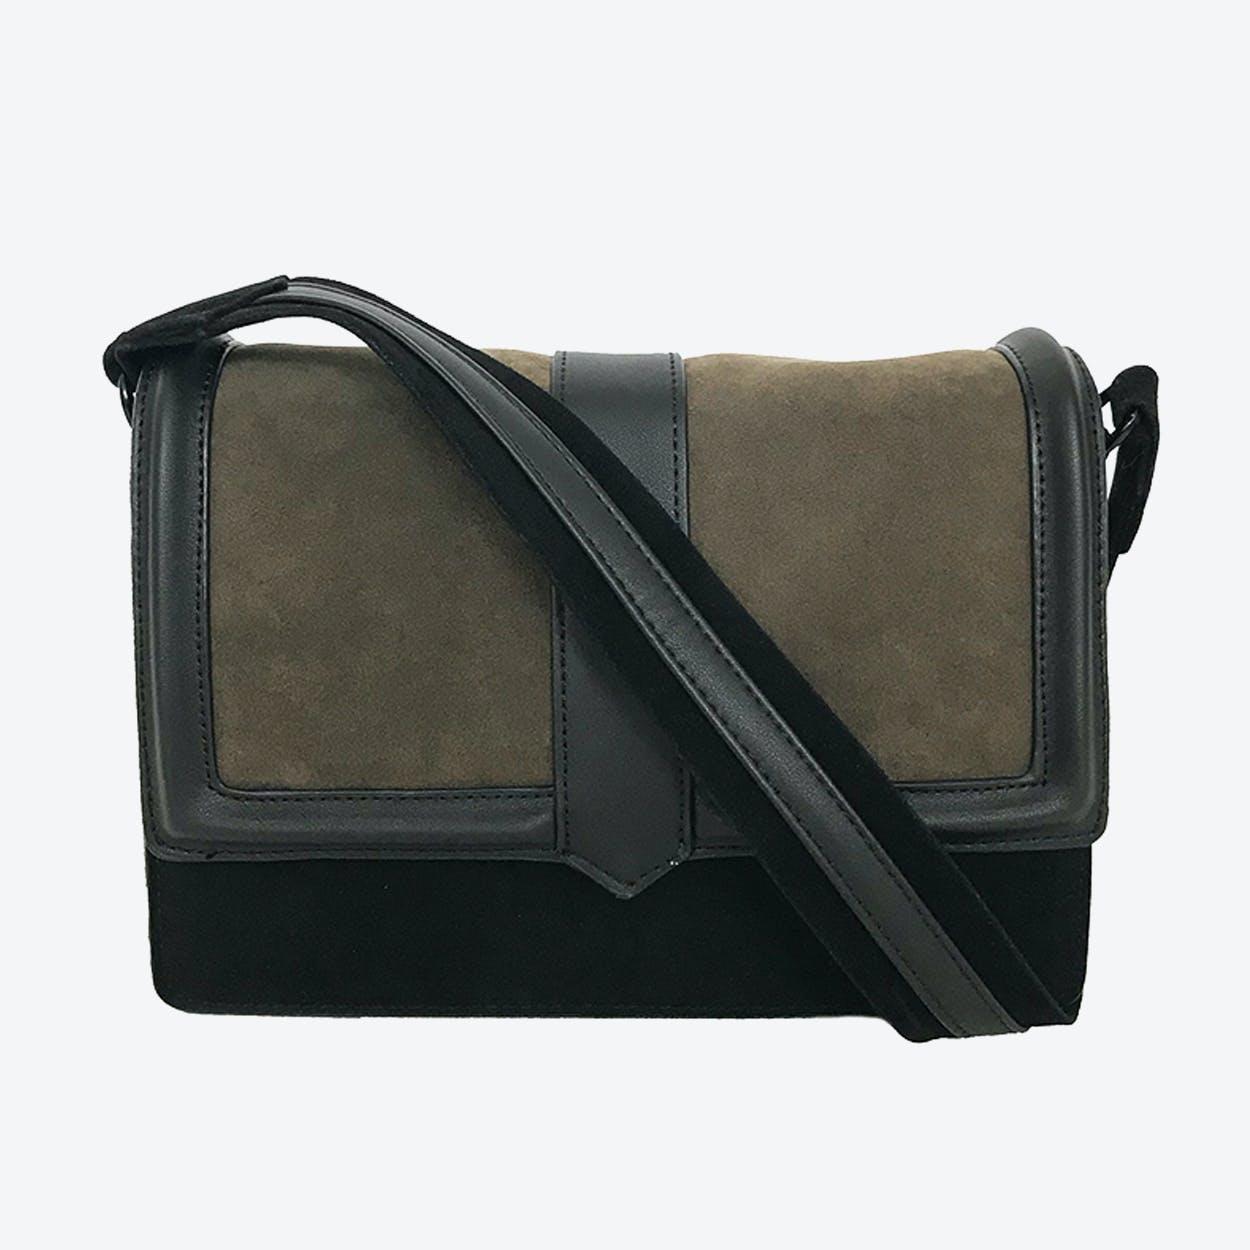 Laval 7 - Crossbody Bag